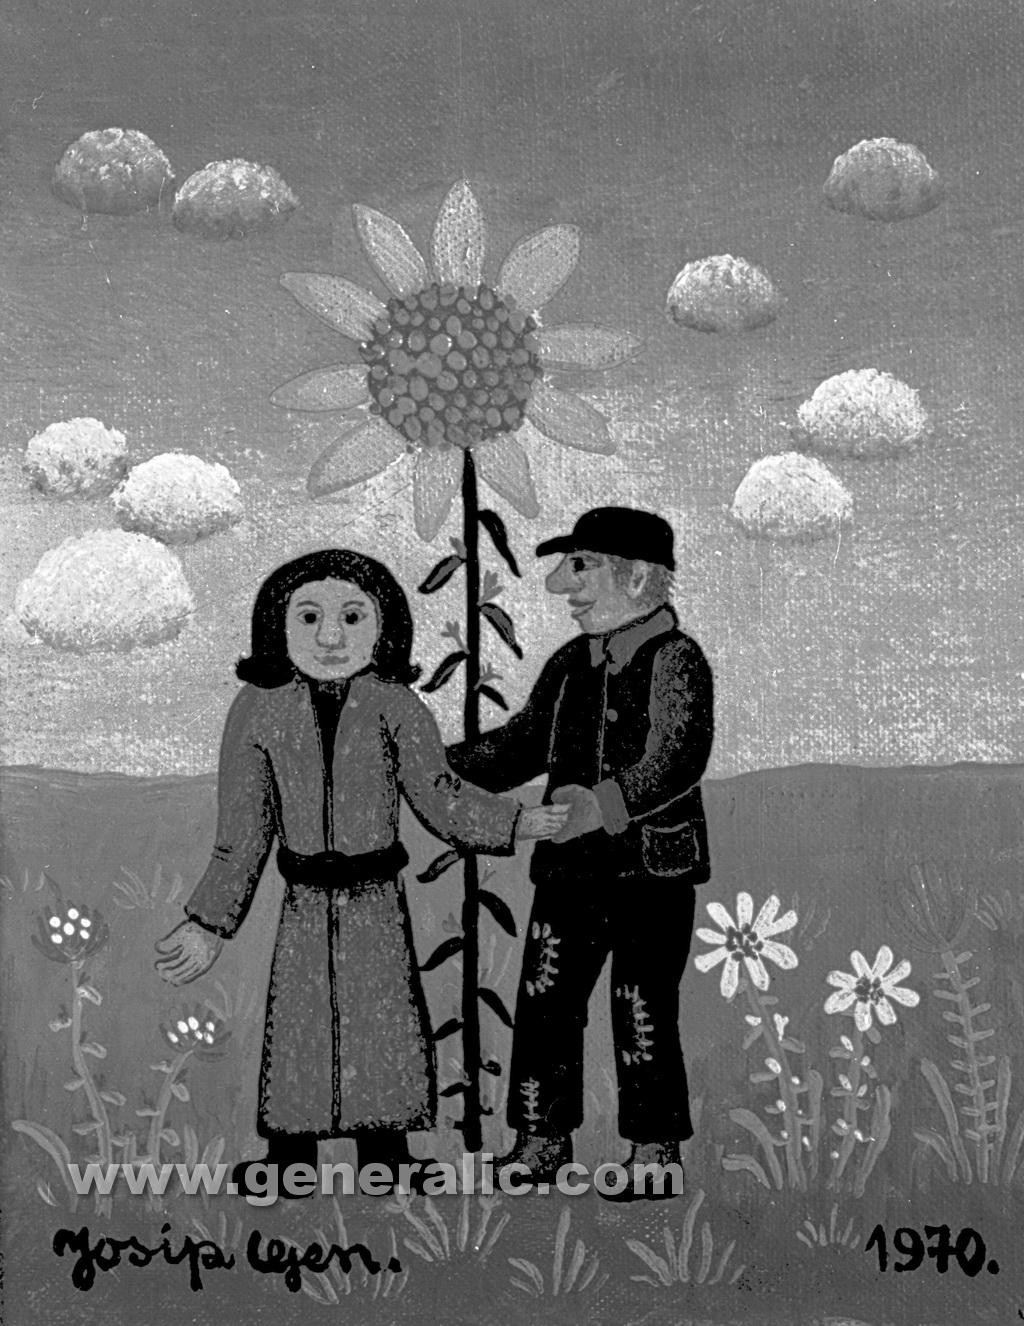 Josip Generalic, 1970, Couple under a flower, oil on canvas